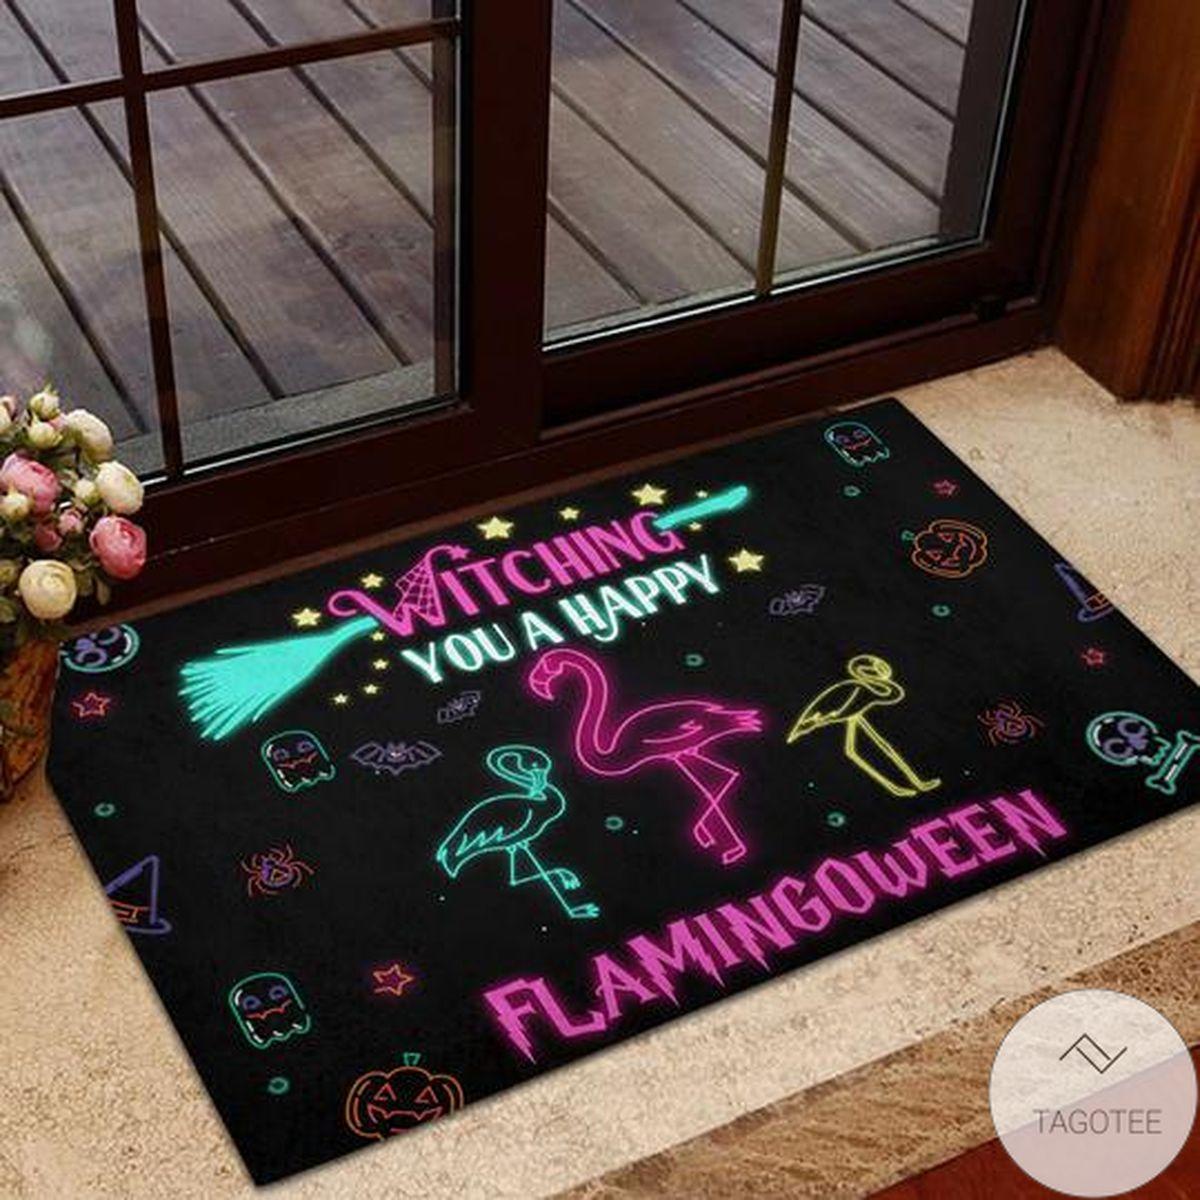 Witching You A Happy Flamingo Wine Doormat